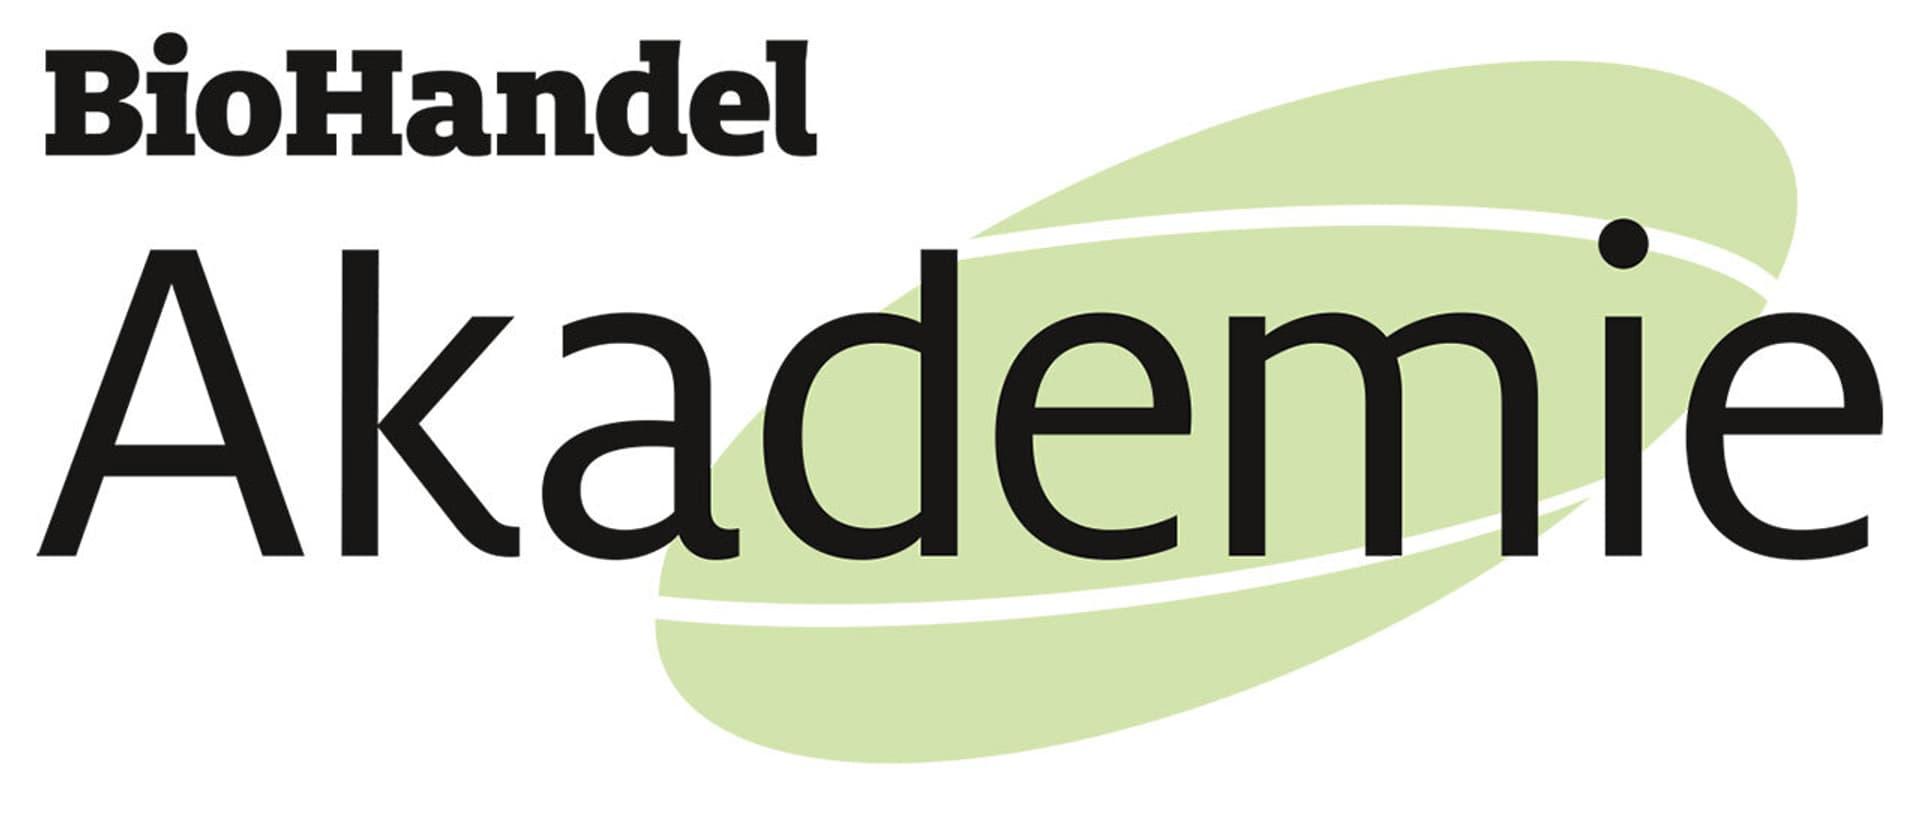 BioHandel Akademie